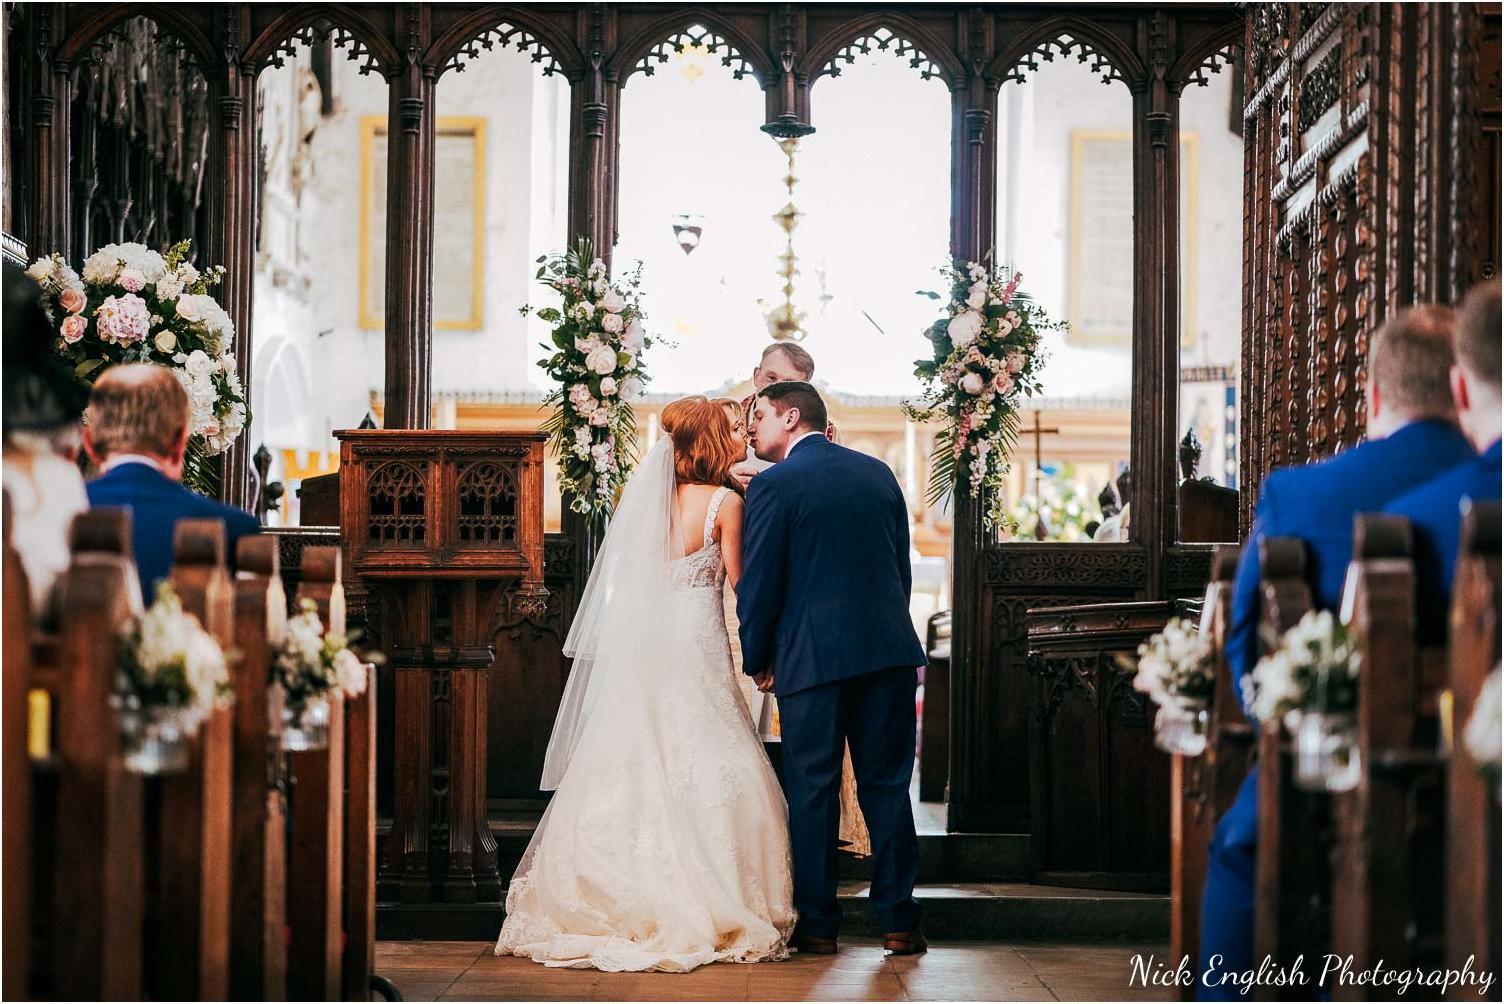 Mitton_Hall_Wedding_Photographer-57.jpg